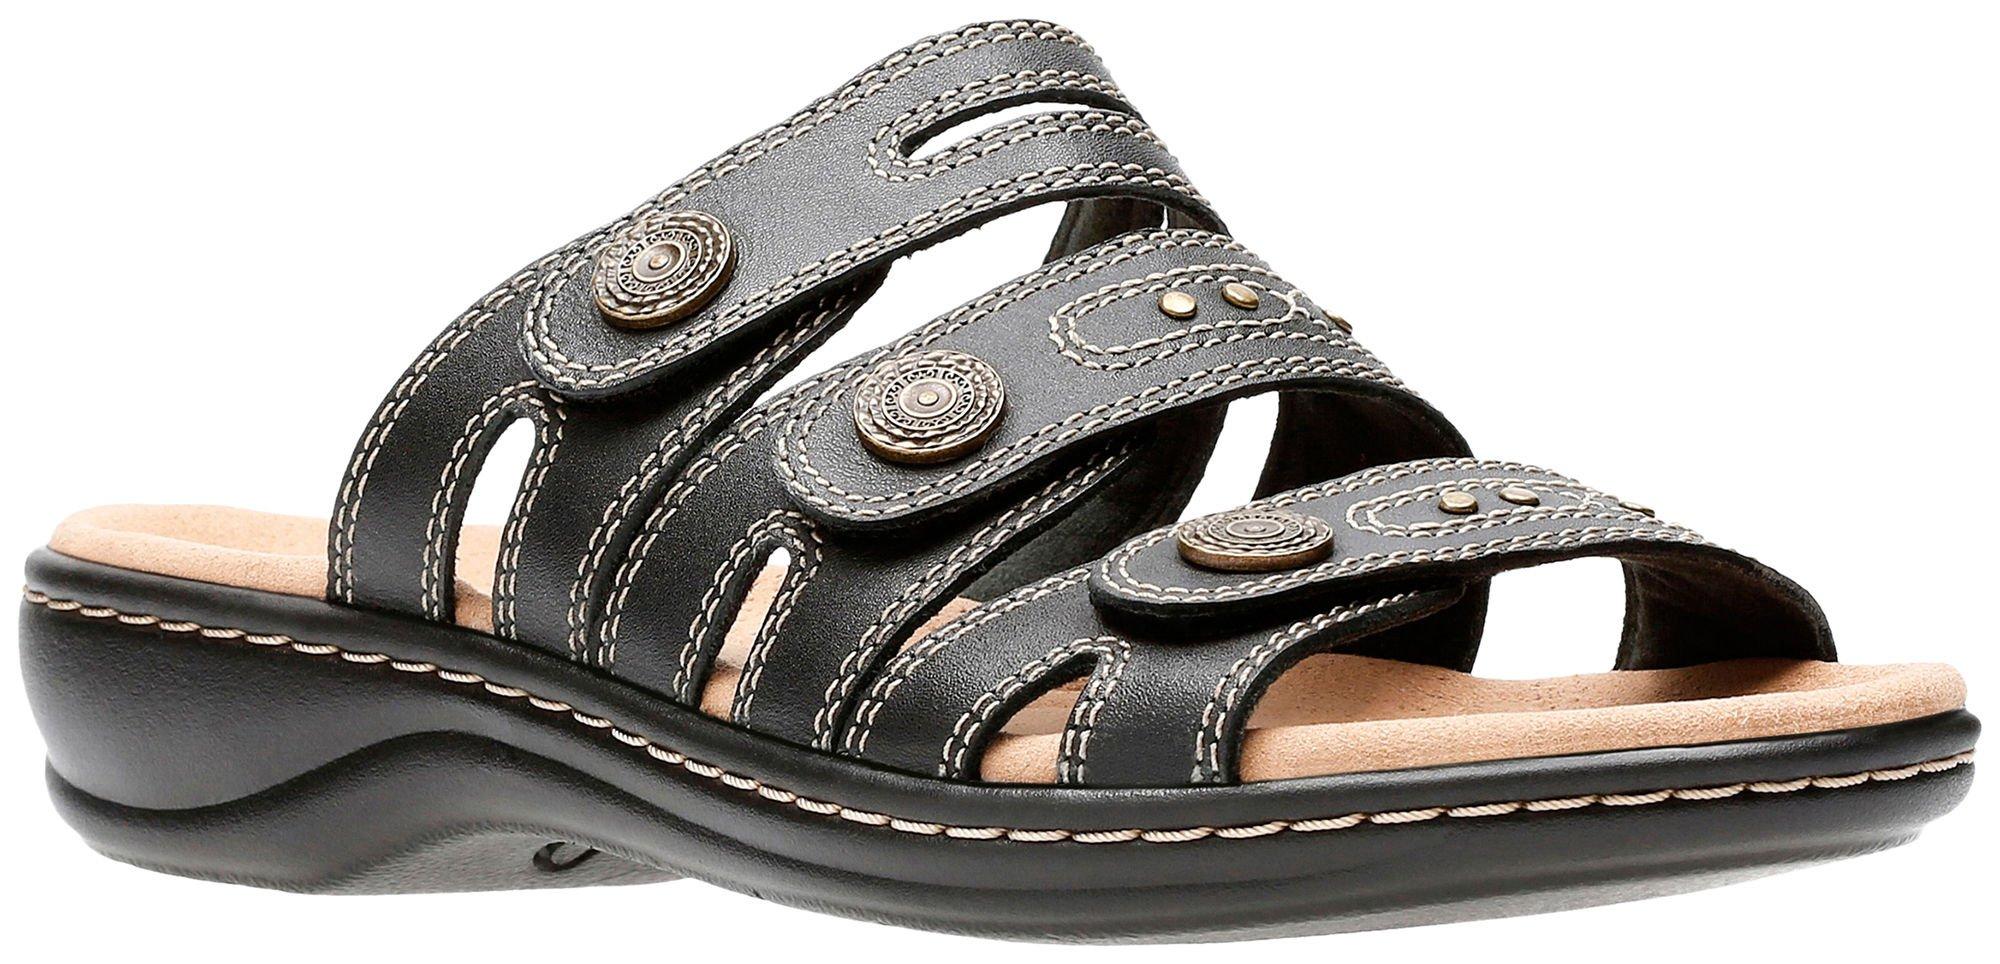 Clarks Women's Leisa Lakia Black Leather Velcro Strap Sandal Size: 8, Width: Medium